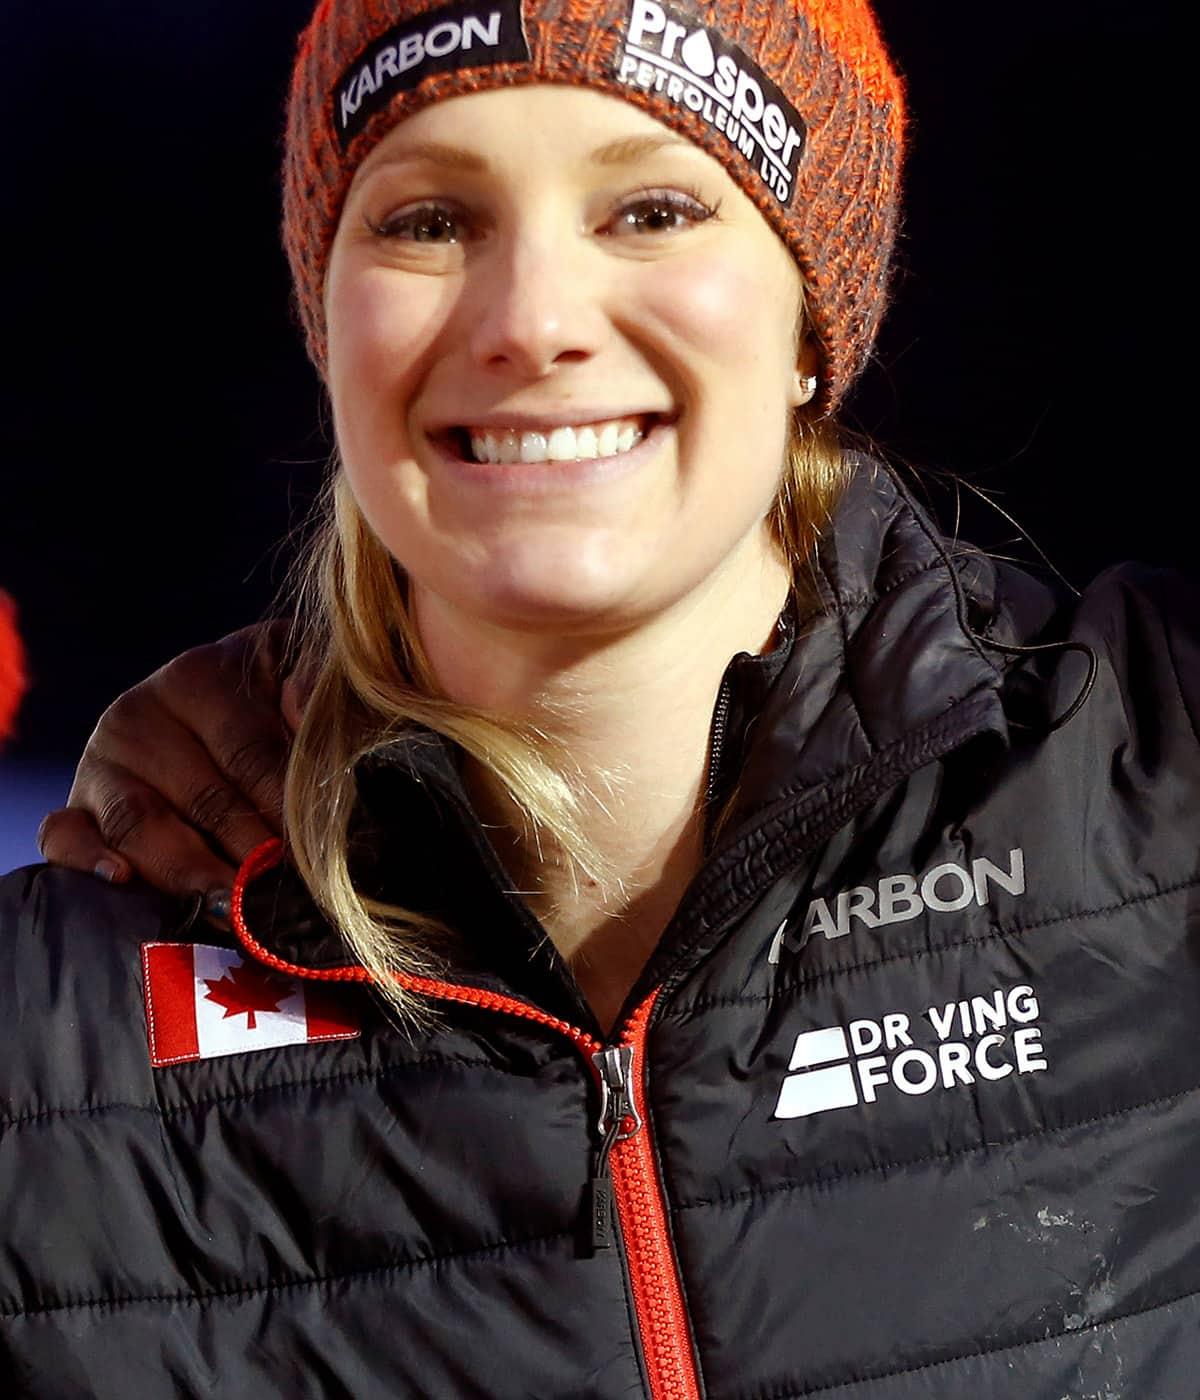 Alysia Rissling: I enjoy throwing myself down an icy chute